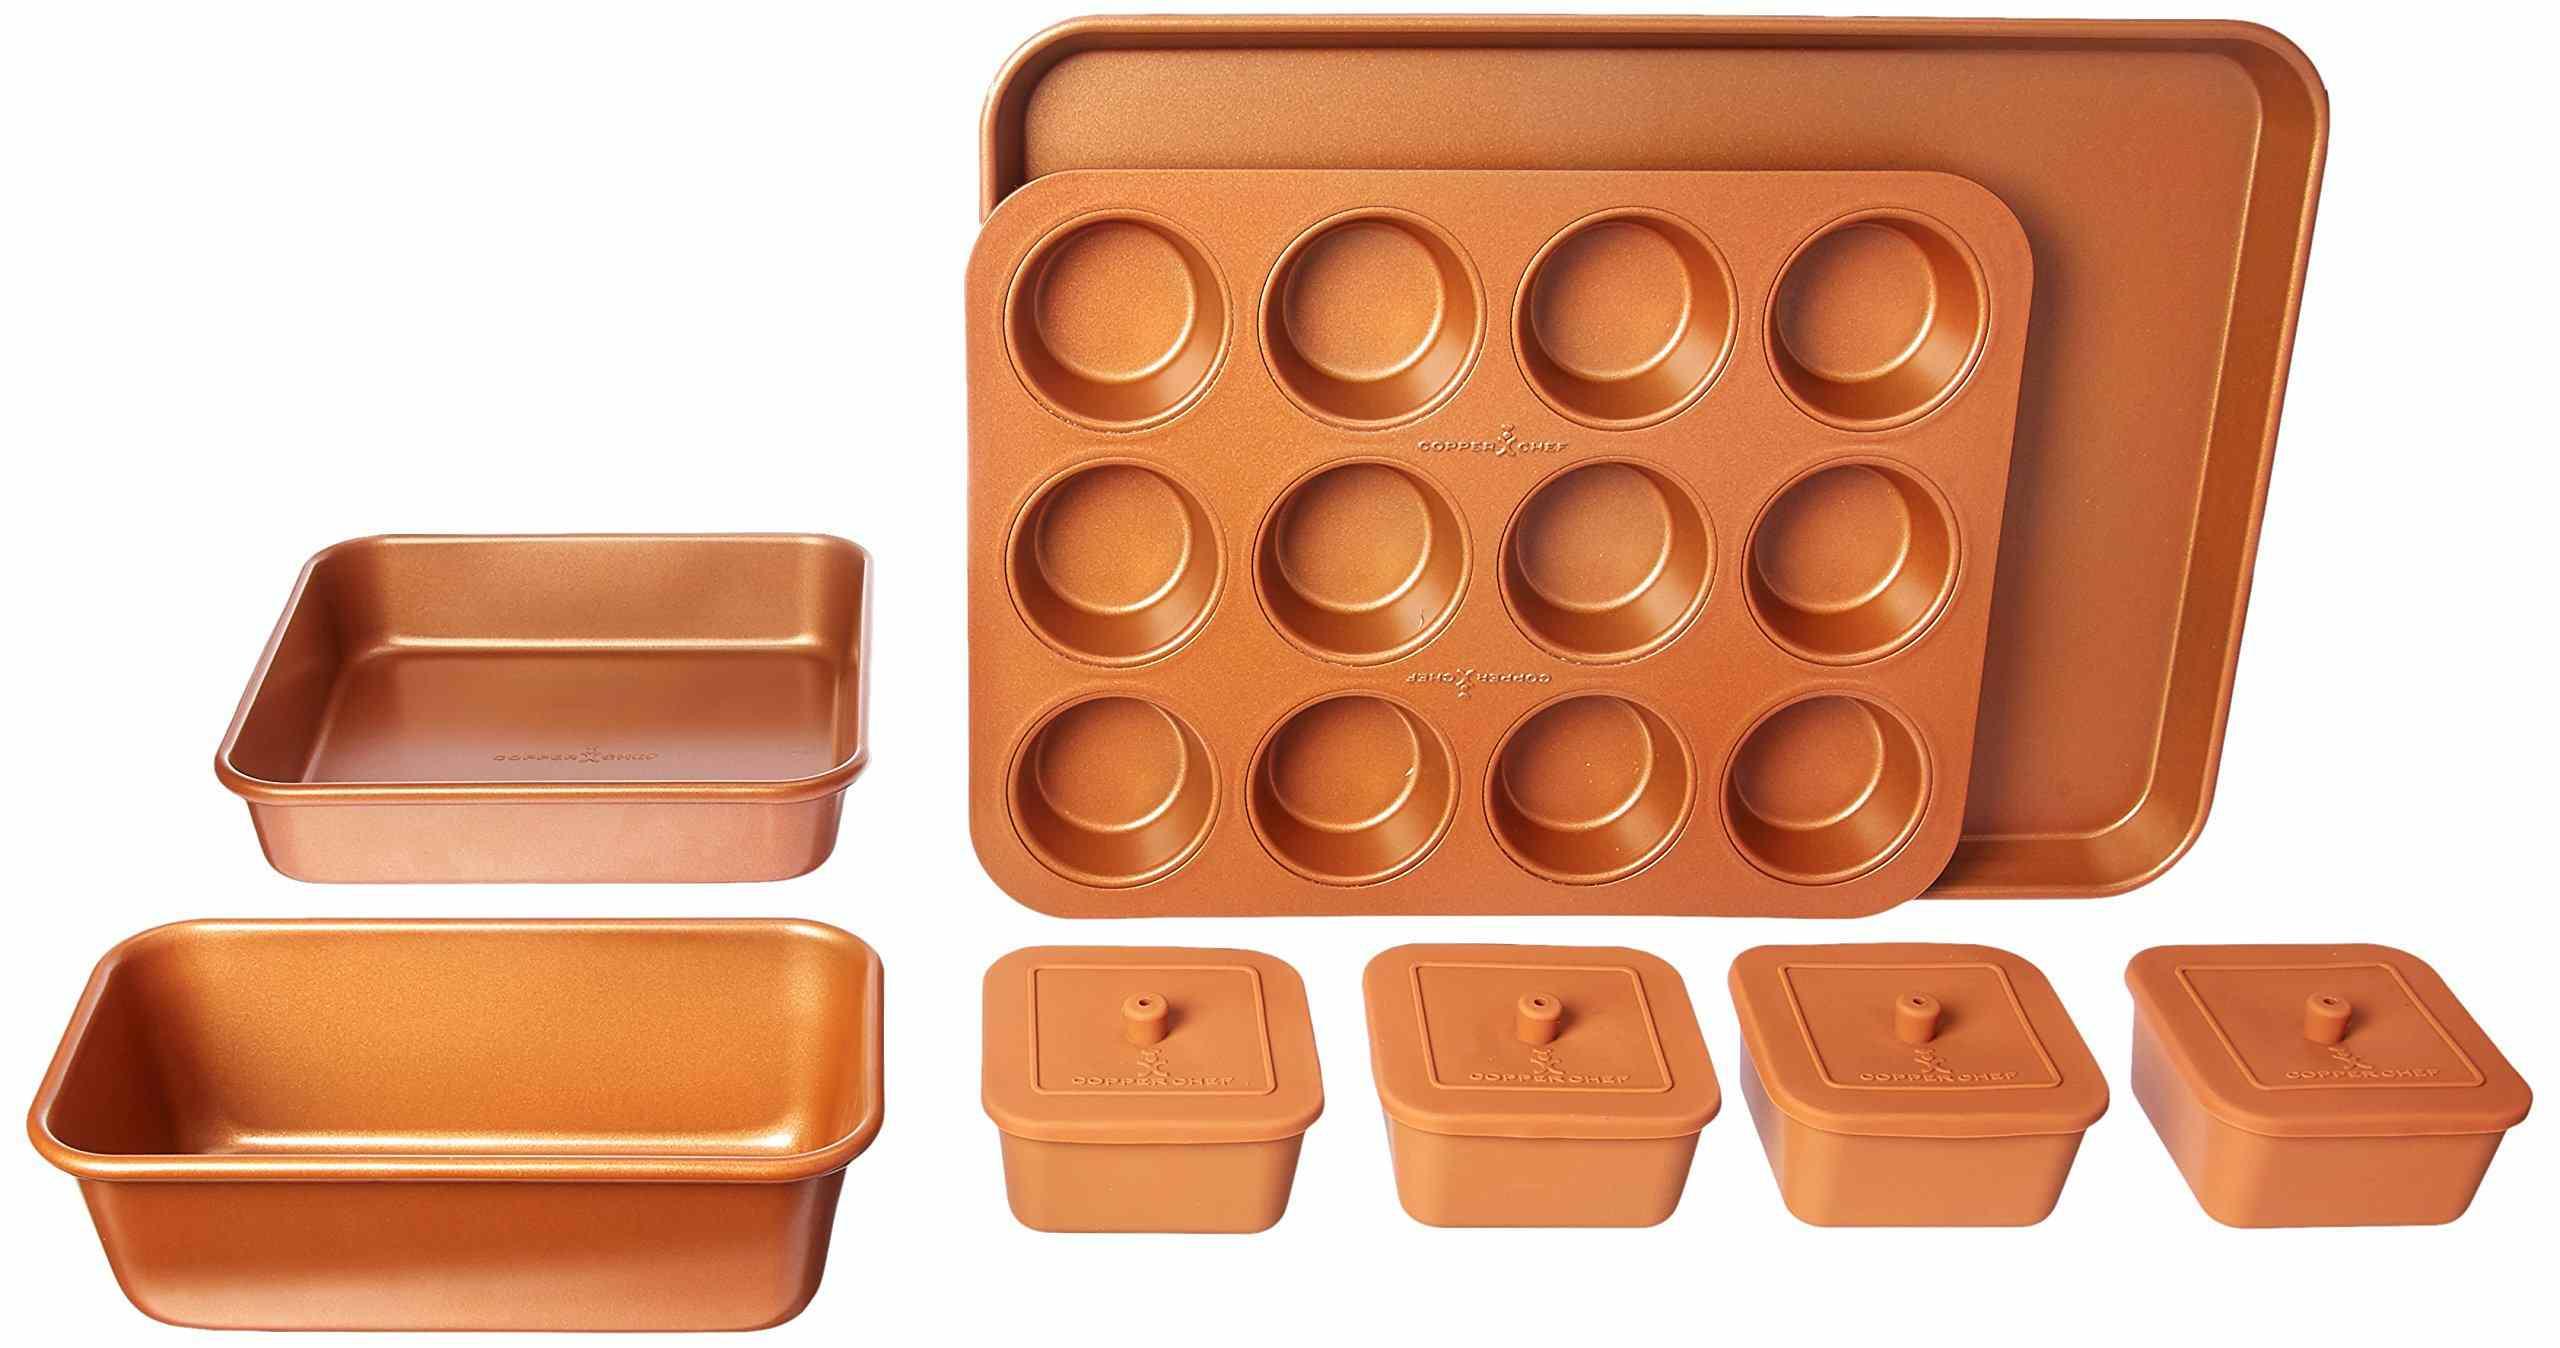 Copper Chef 12-Piece Set Nonstick Oven Bakeware